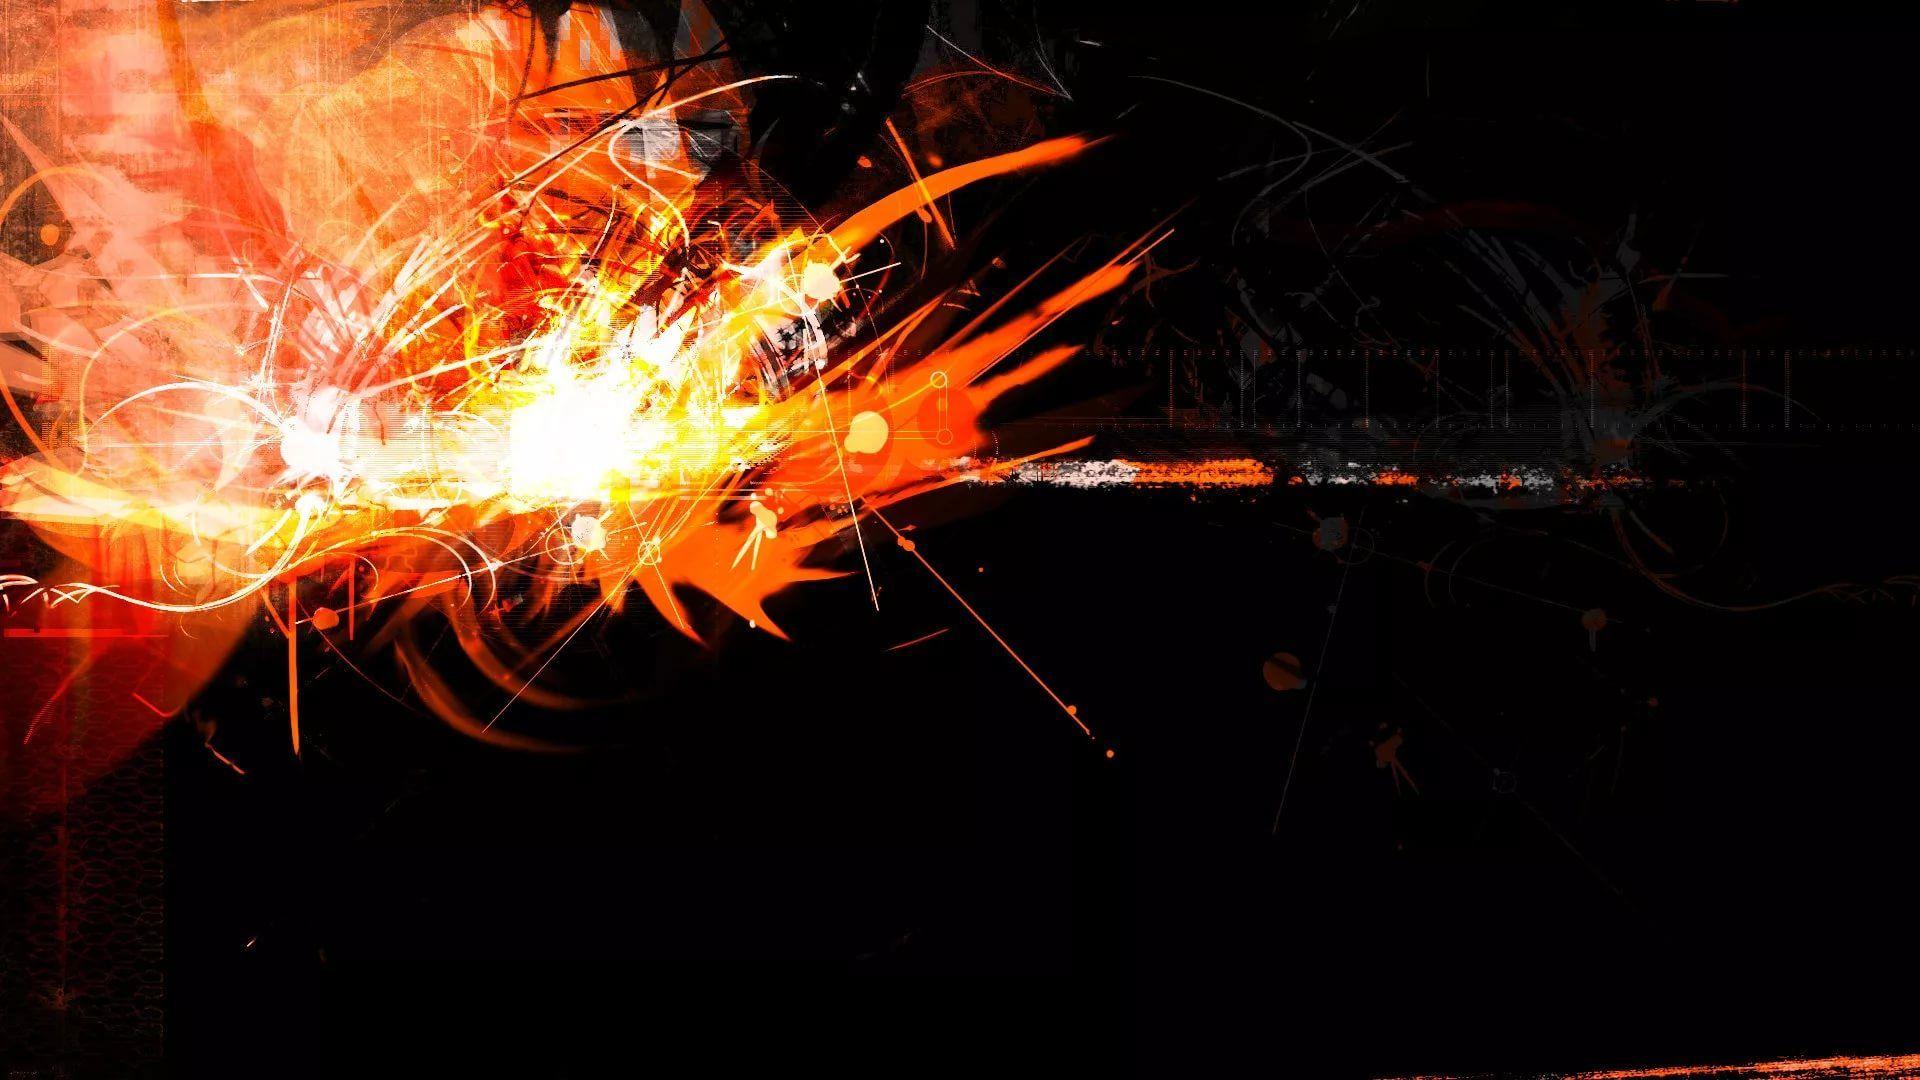 Black And Orange hd wallpaper download